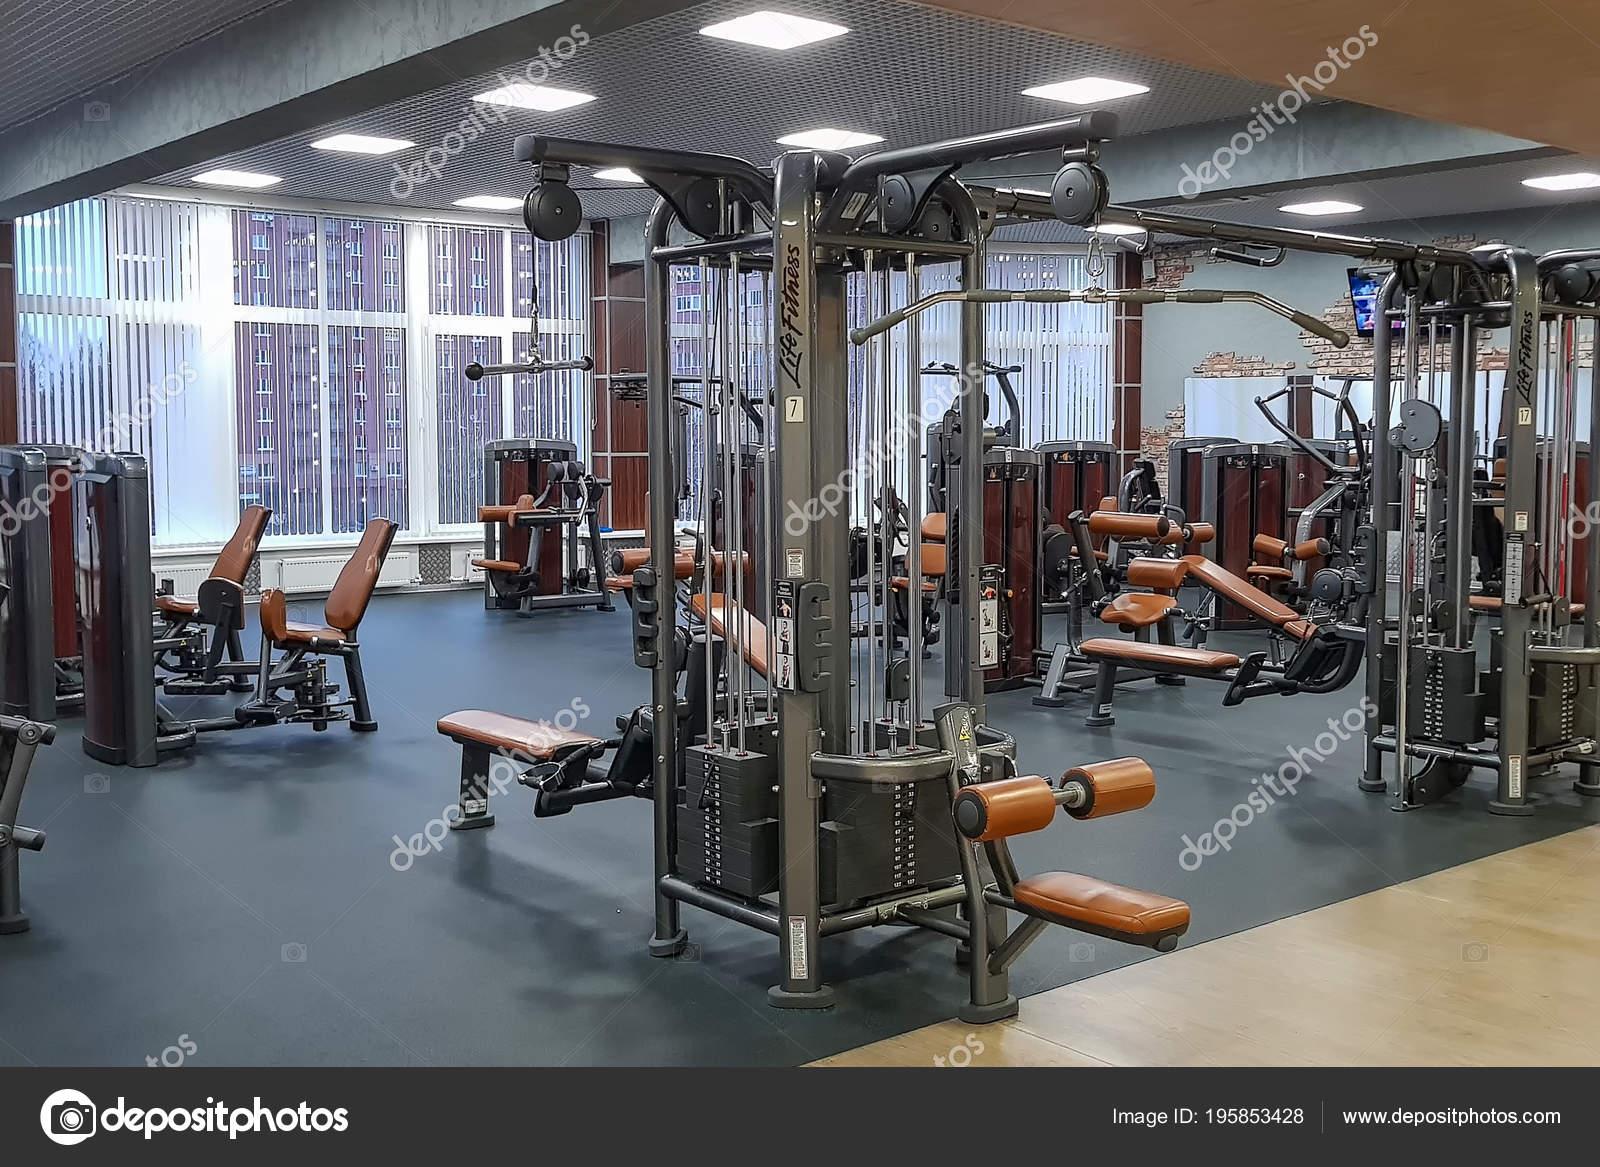 Equipements Appareils Fitness Dans Salle Sport Moderne Vide Dans